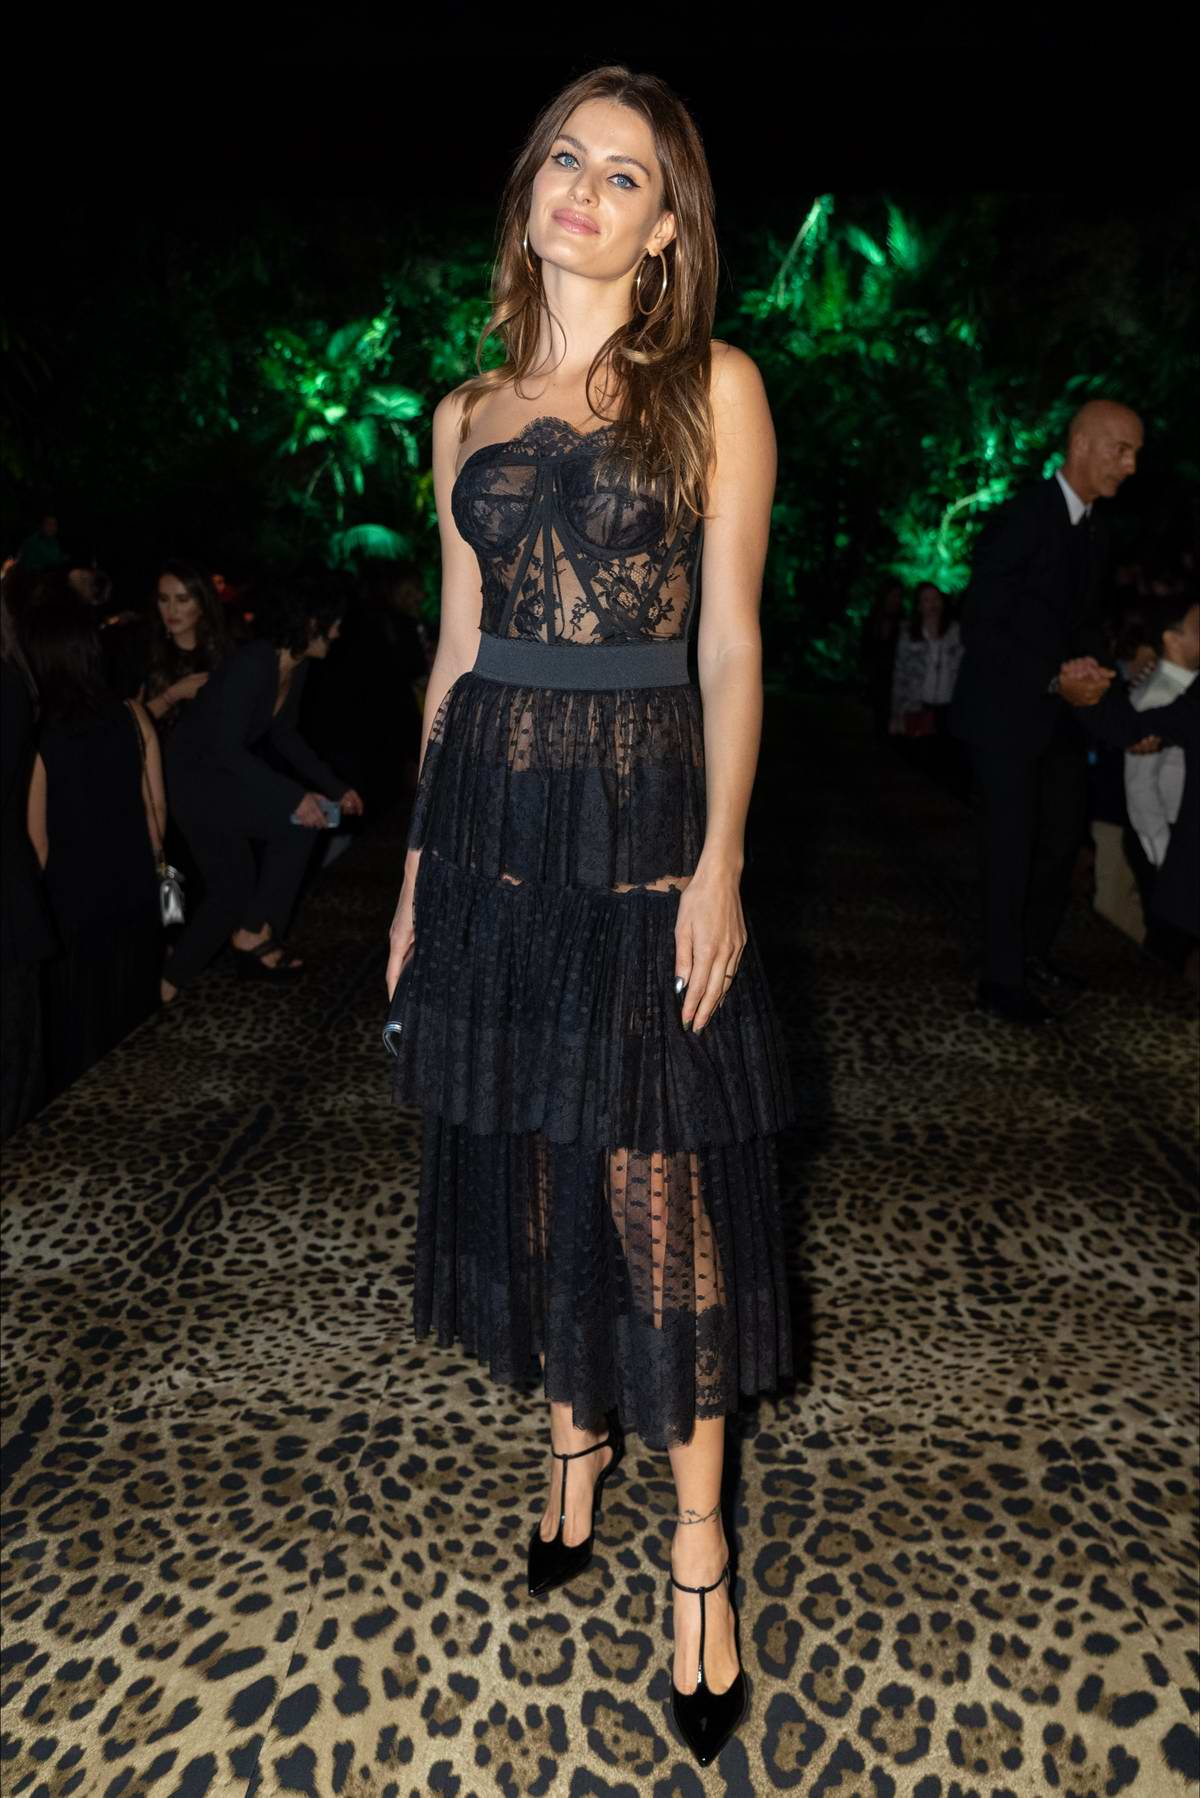 Isabeli Fontana attends Dolce & Gabbana show during Milan Fashion Week, Spring/Summer 2020 in Milan, Italy